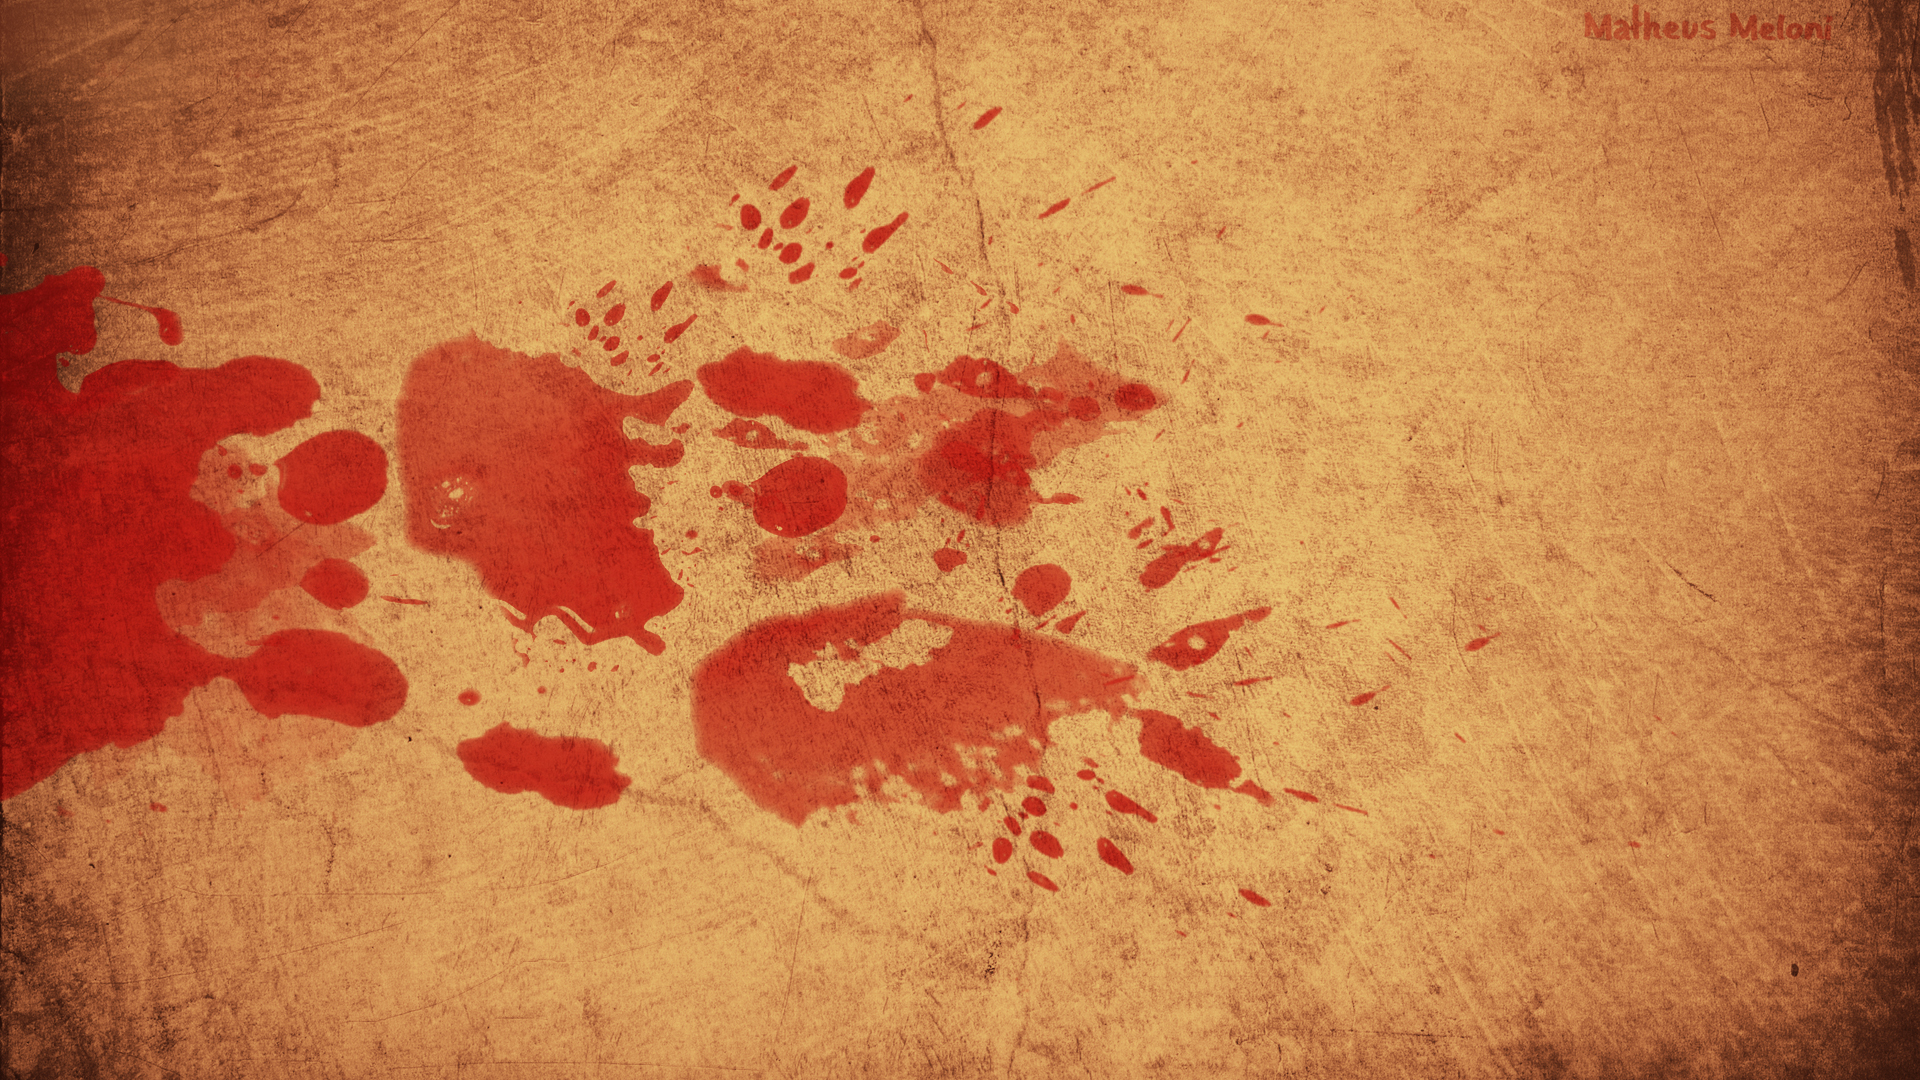 bloody splatter wallpaper - photo #25